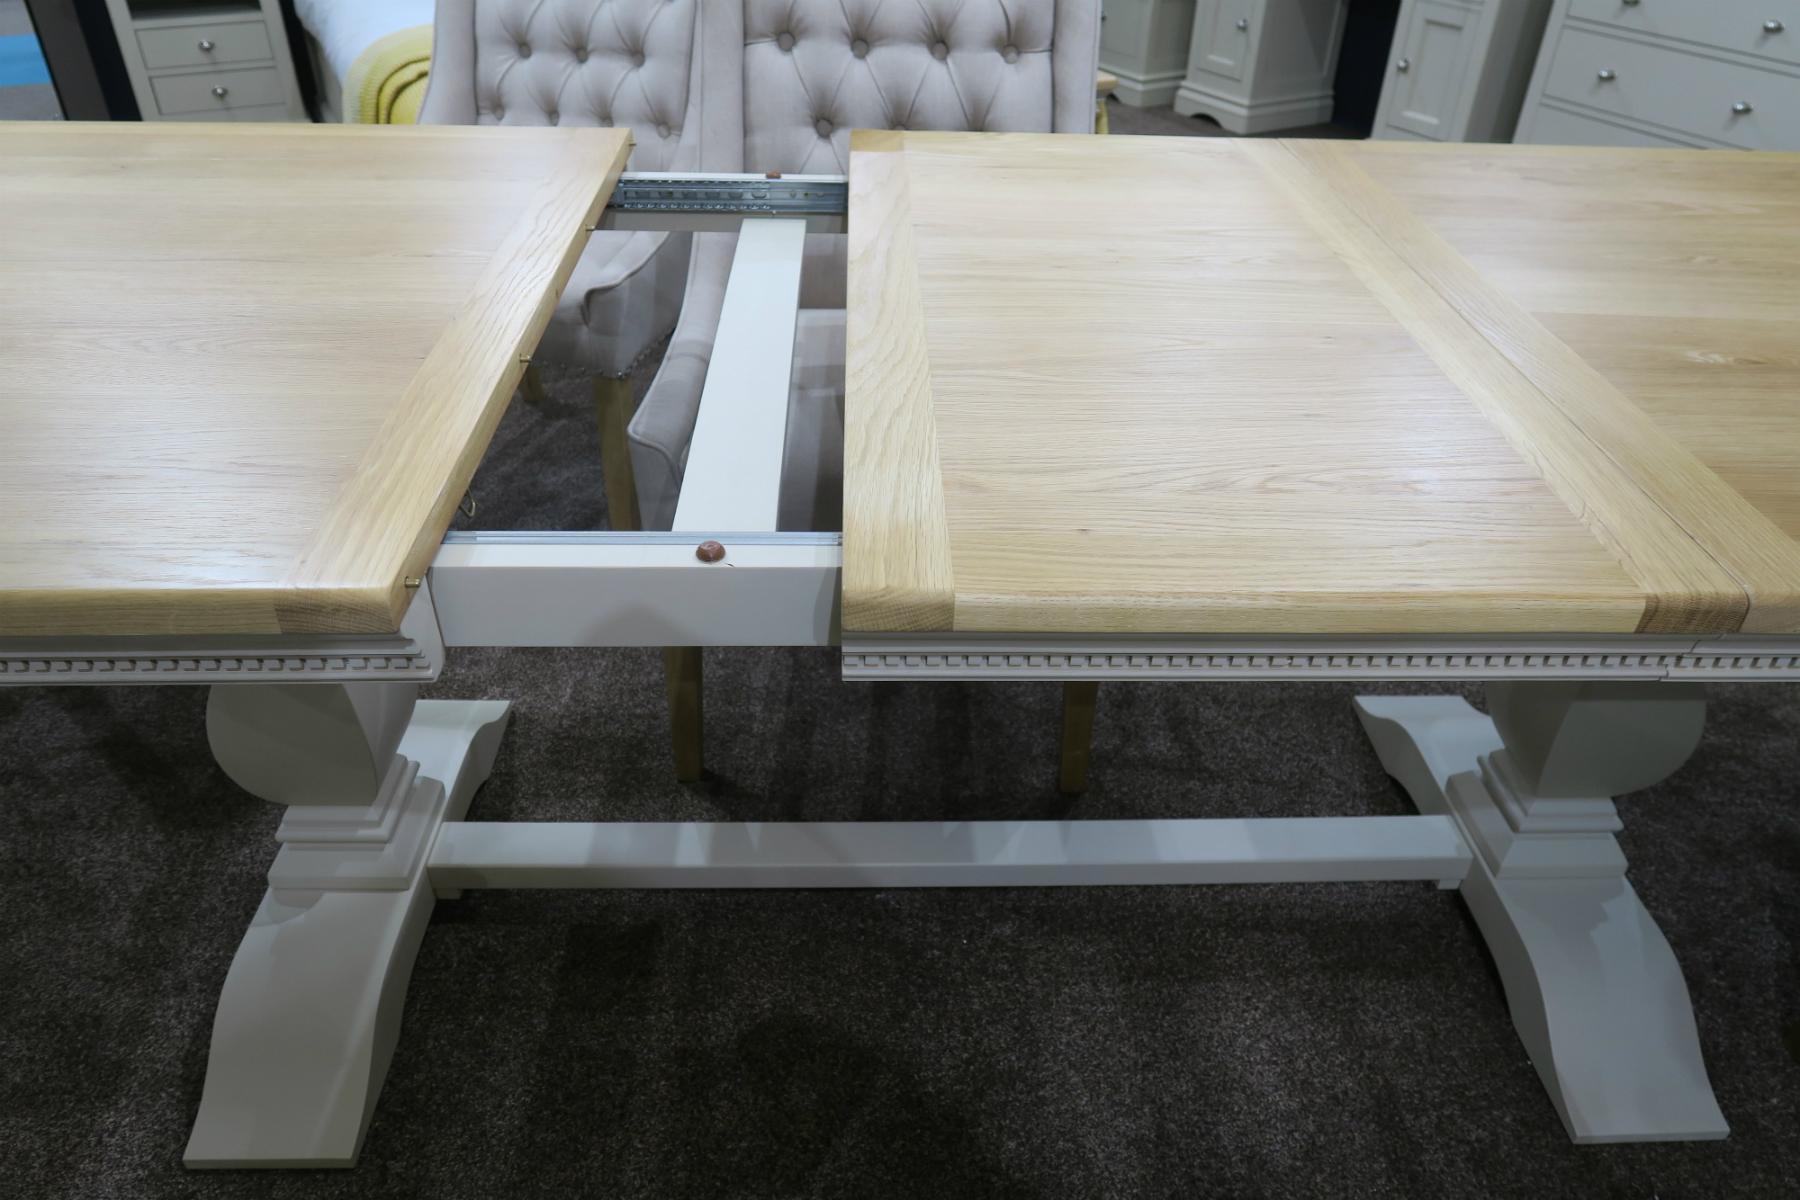 Vida living Winchester extended table